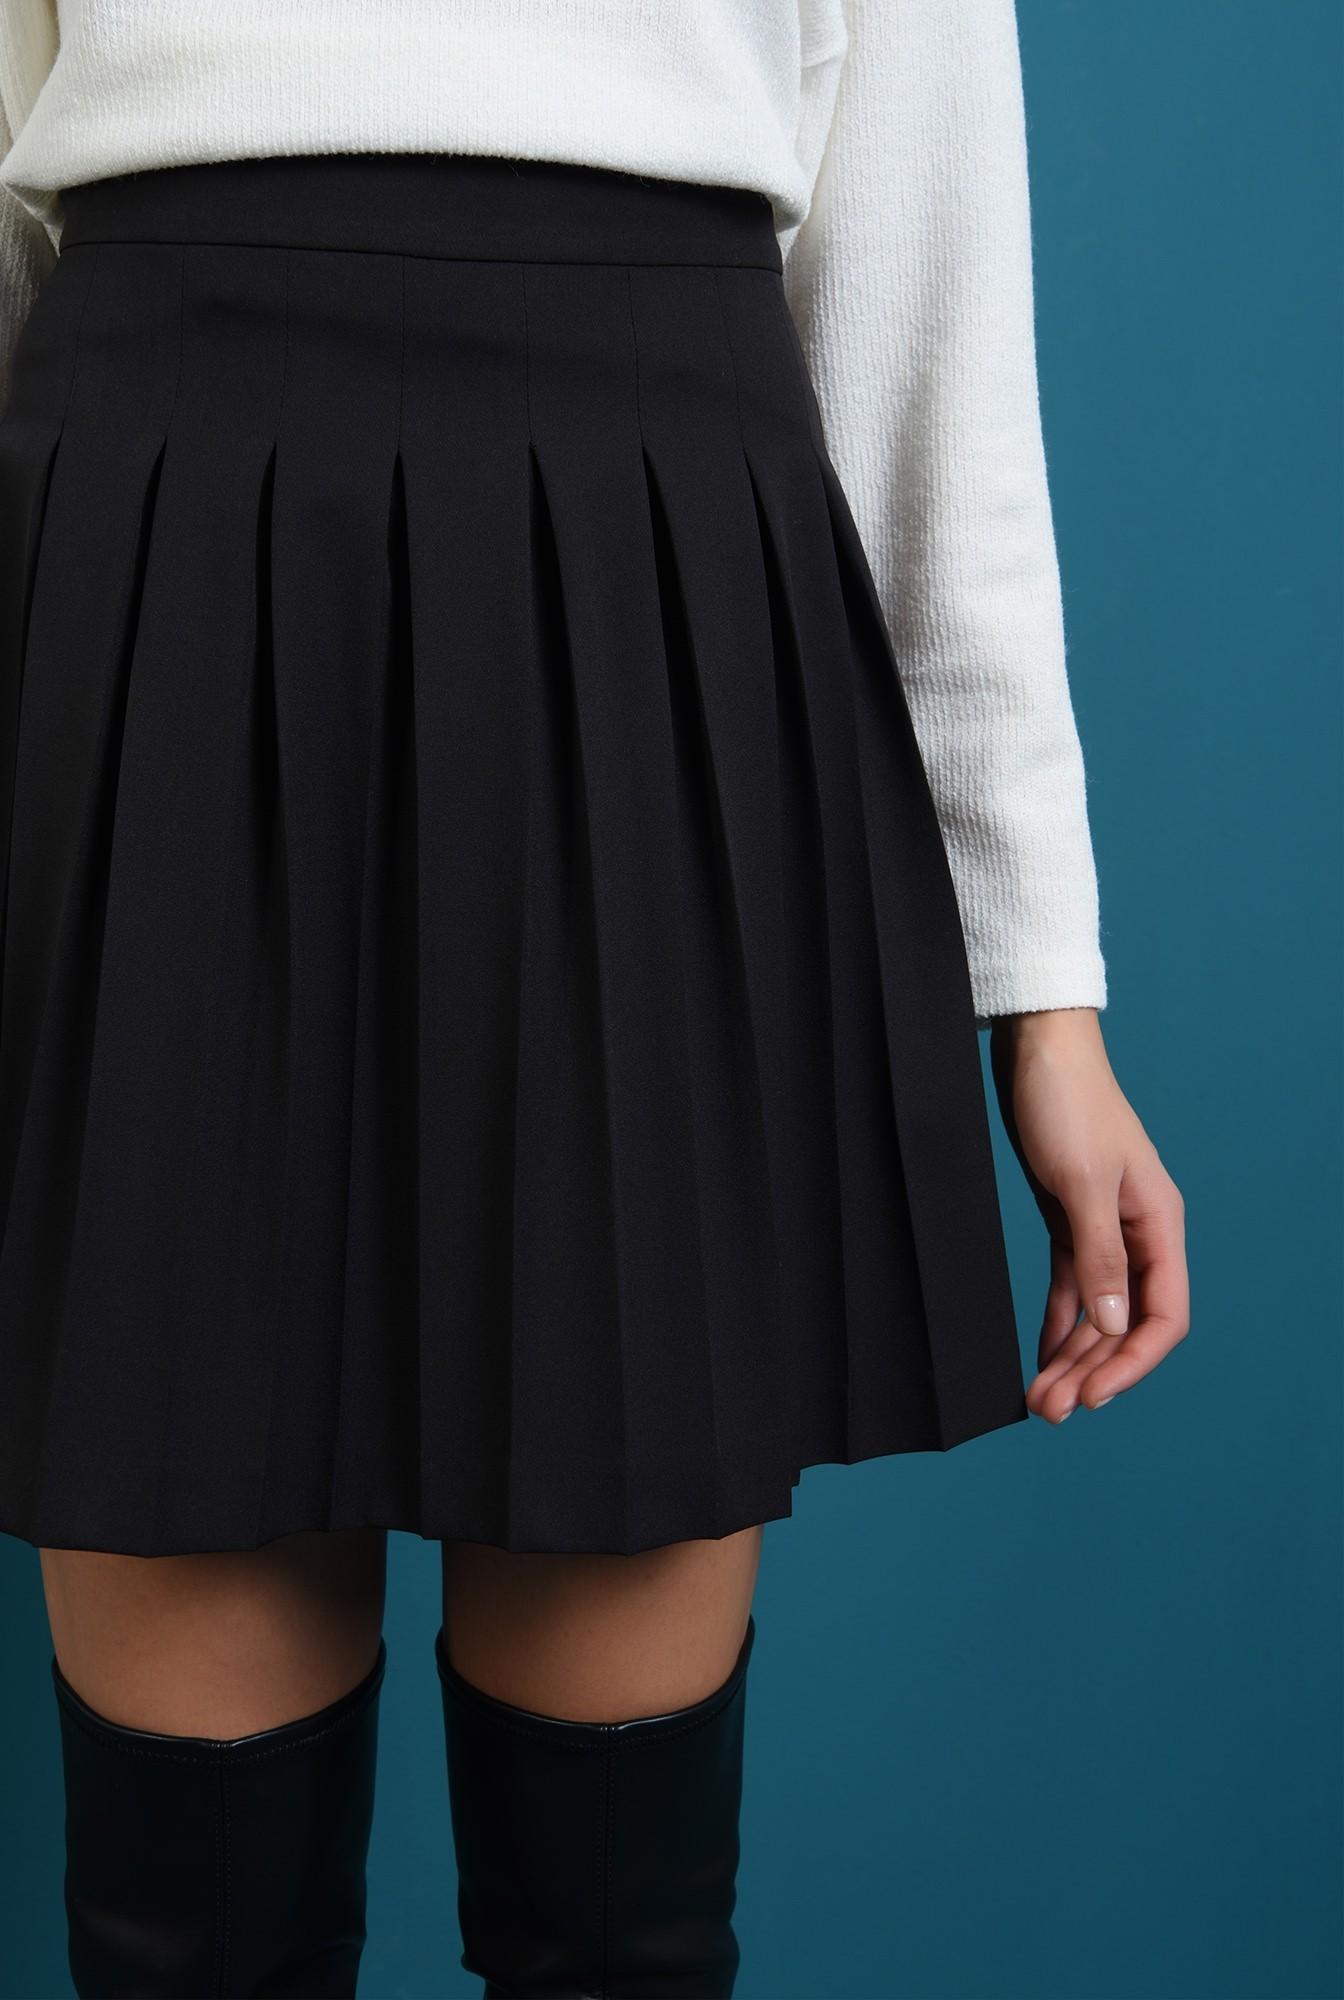 2 - fusta neagra,mini, cu pliuri, cu talie inalta